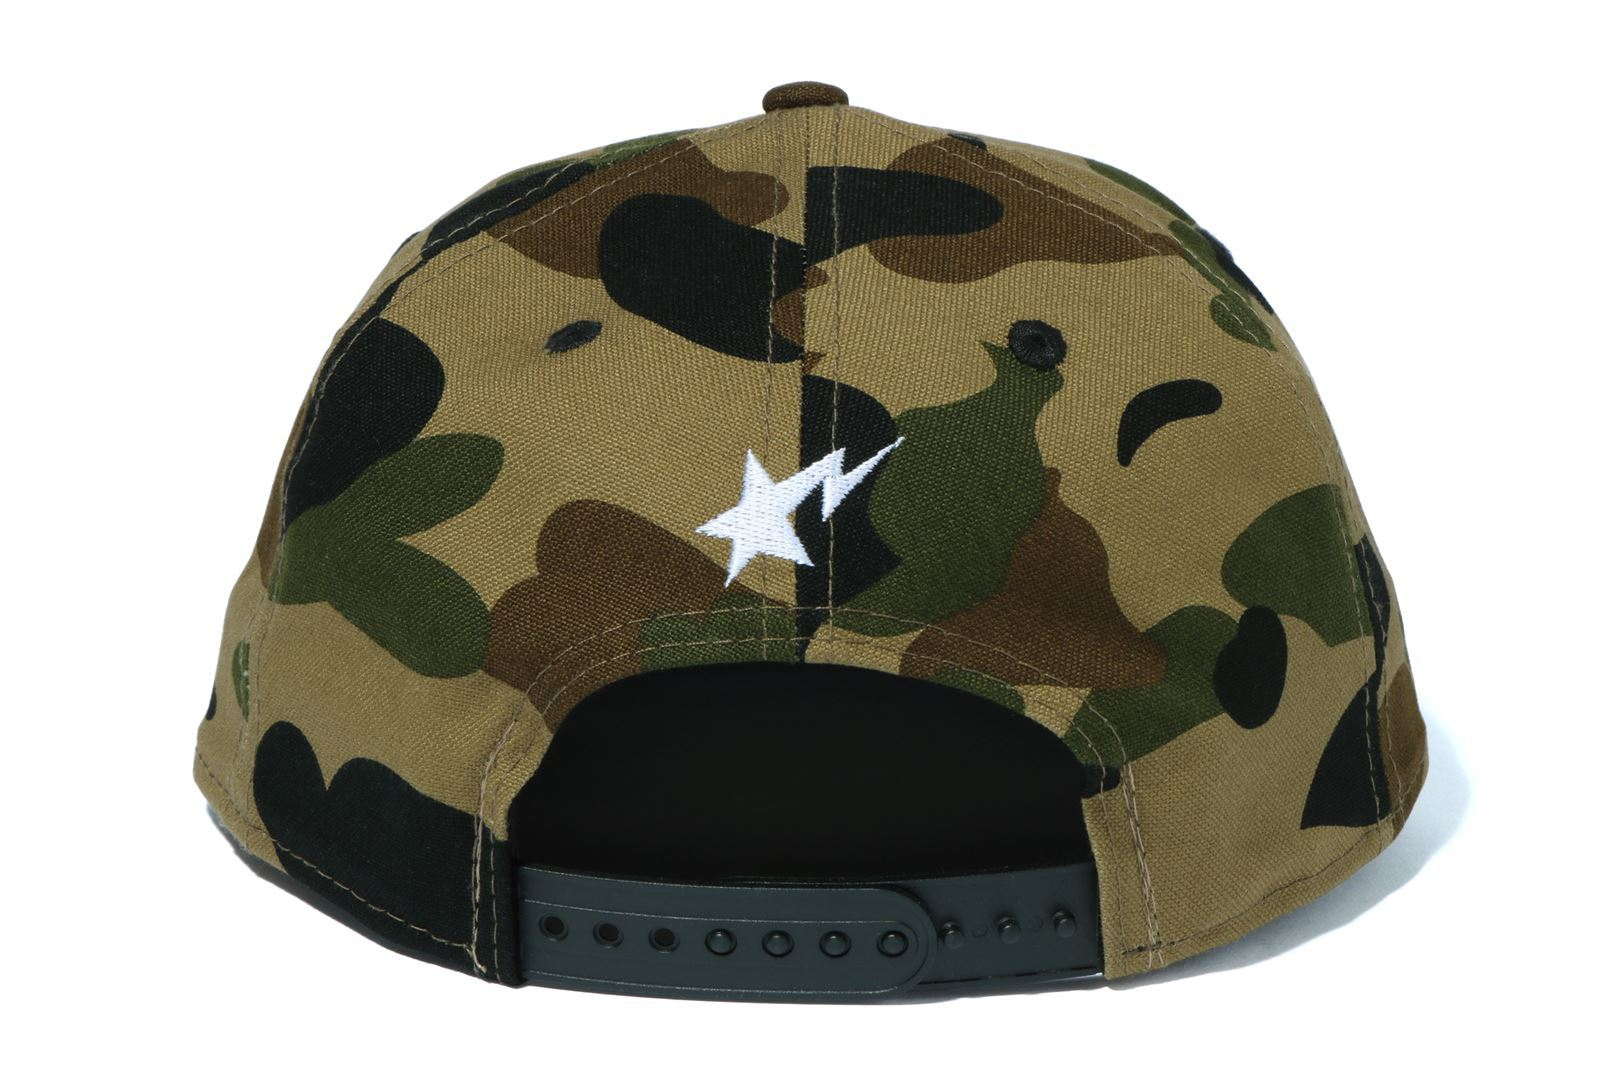 1ST CAMO BAPE NEW ERA SNAP BACK CAP_a0174495_17594136.jpg